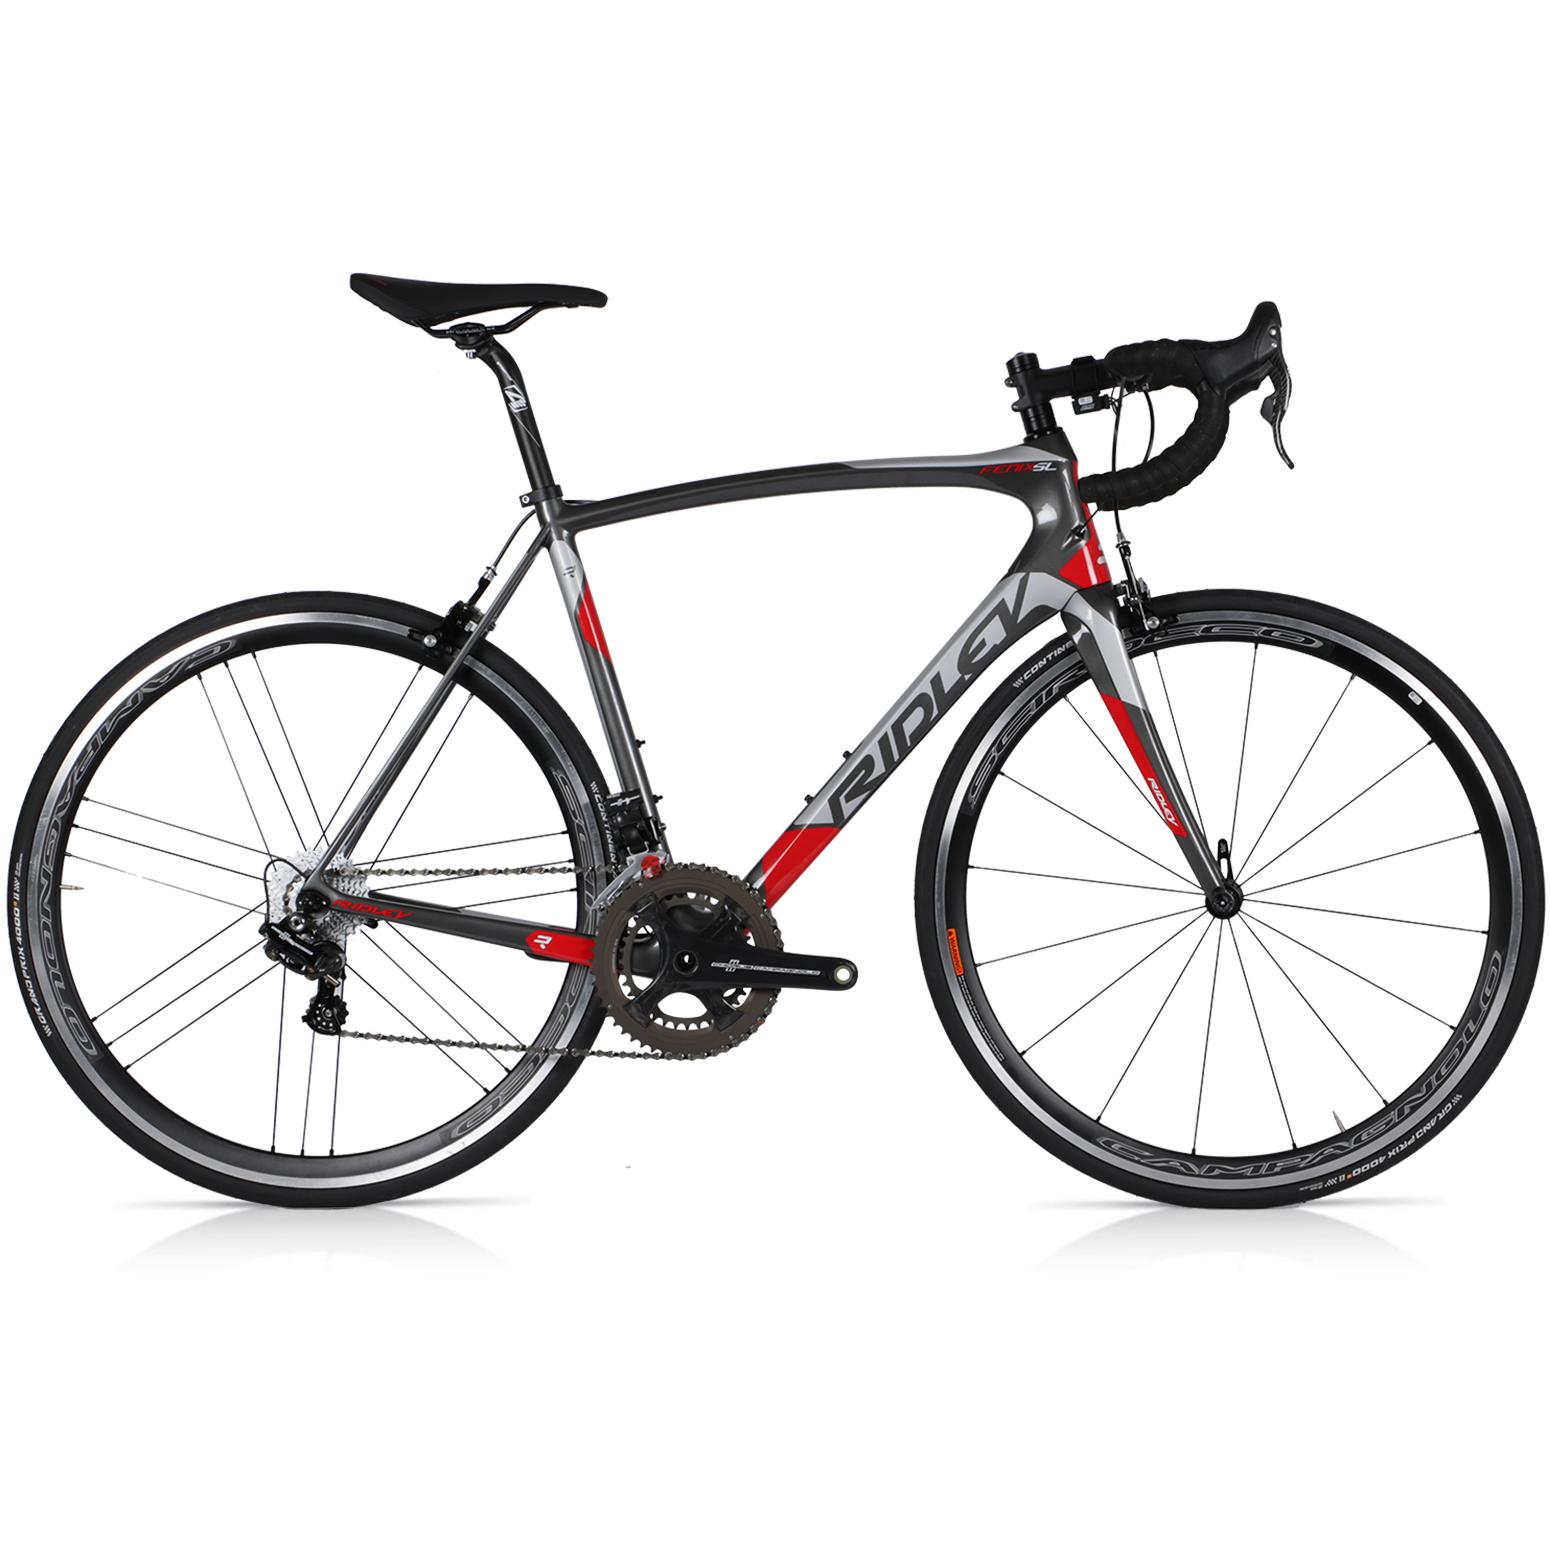 Ridley Fenix SL Chorus EPS Carbon Road Bike